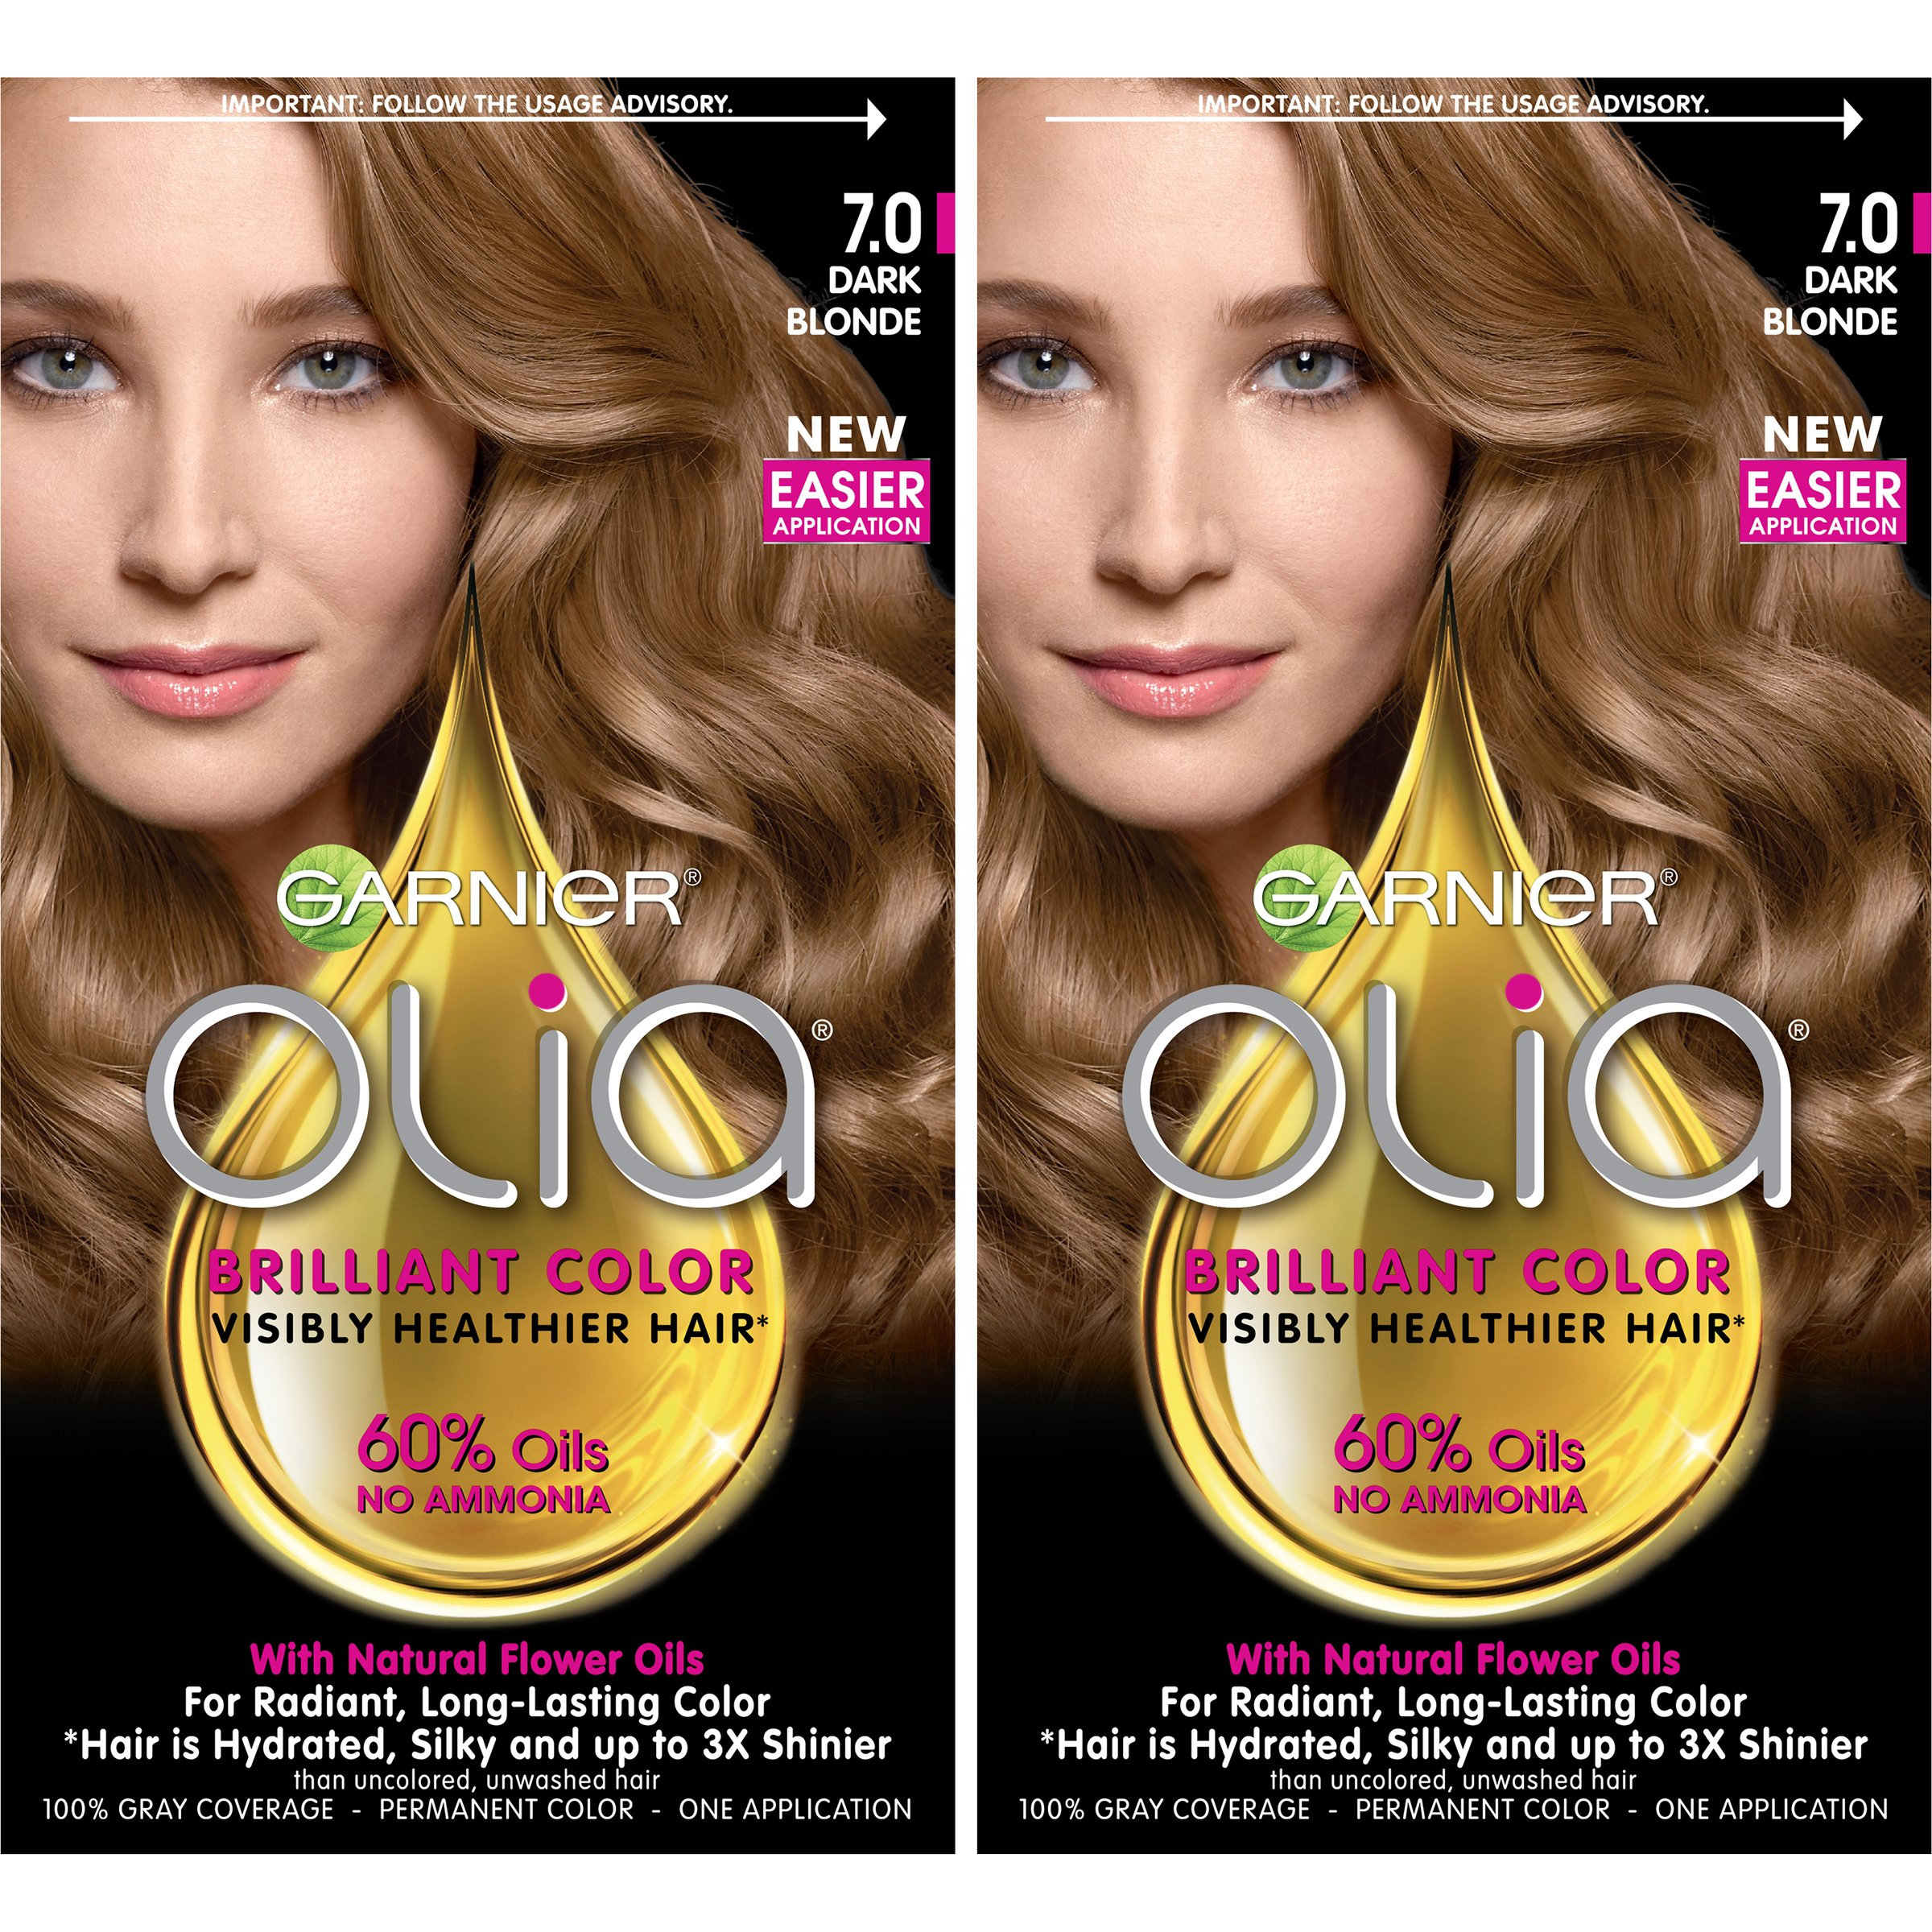 Garnier Olia Ammonia-Free Brilliant Color Oil-Rich Permanent Hair Color, 7.0 Dark Blonde (2 Count) Blonde Hair Dye by Garnier